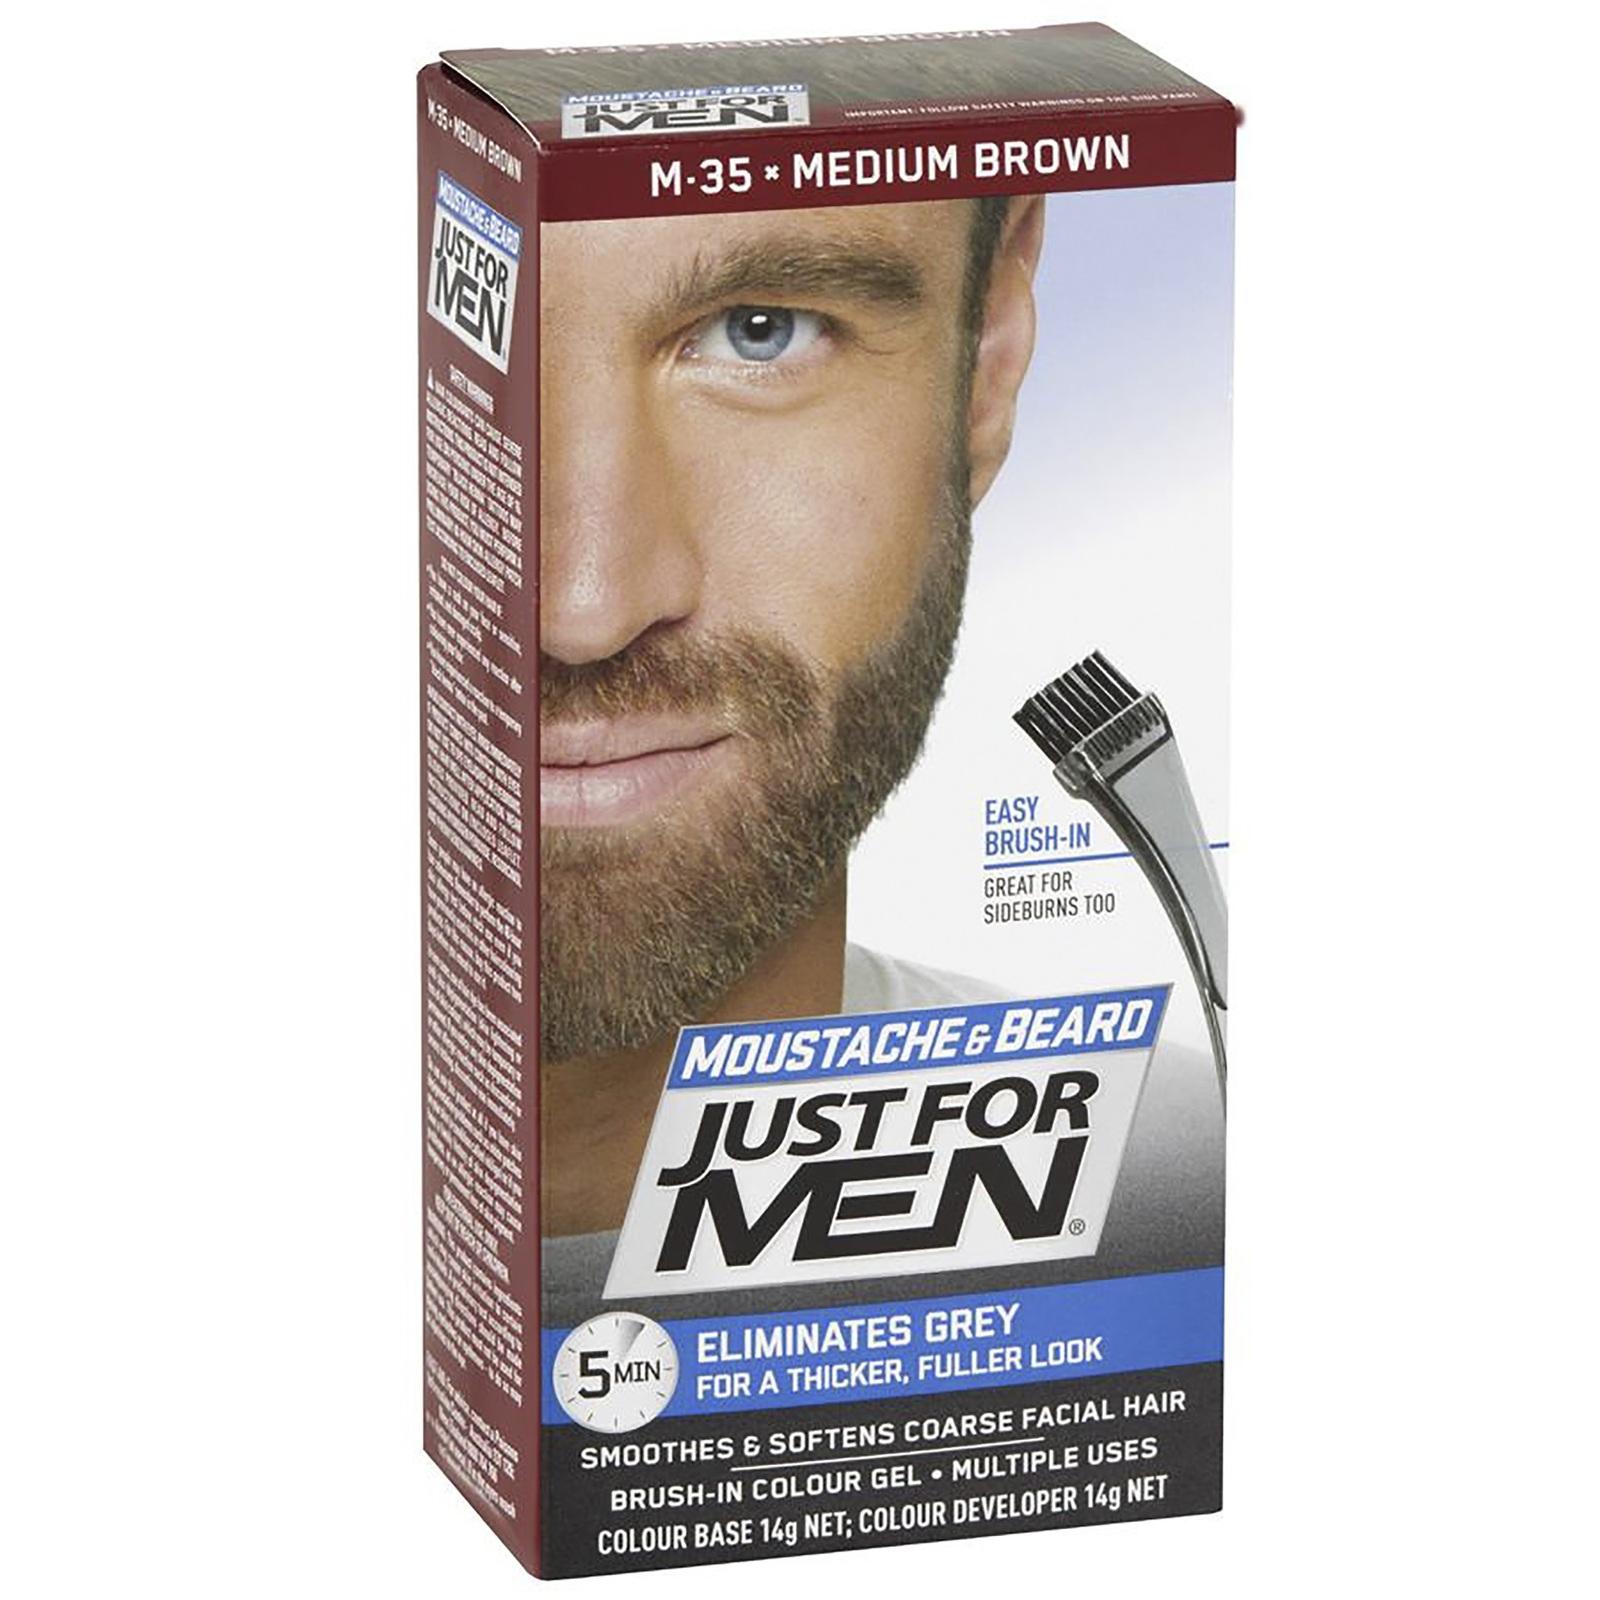 Just For Men Moustache & Beard Colour - Medium Brown image